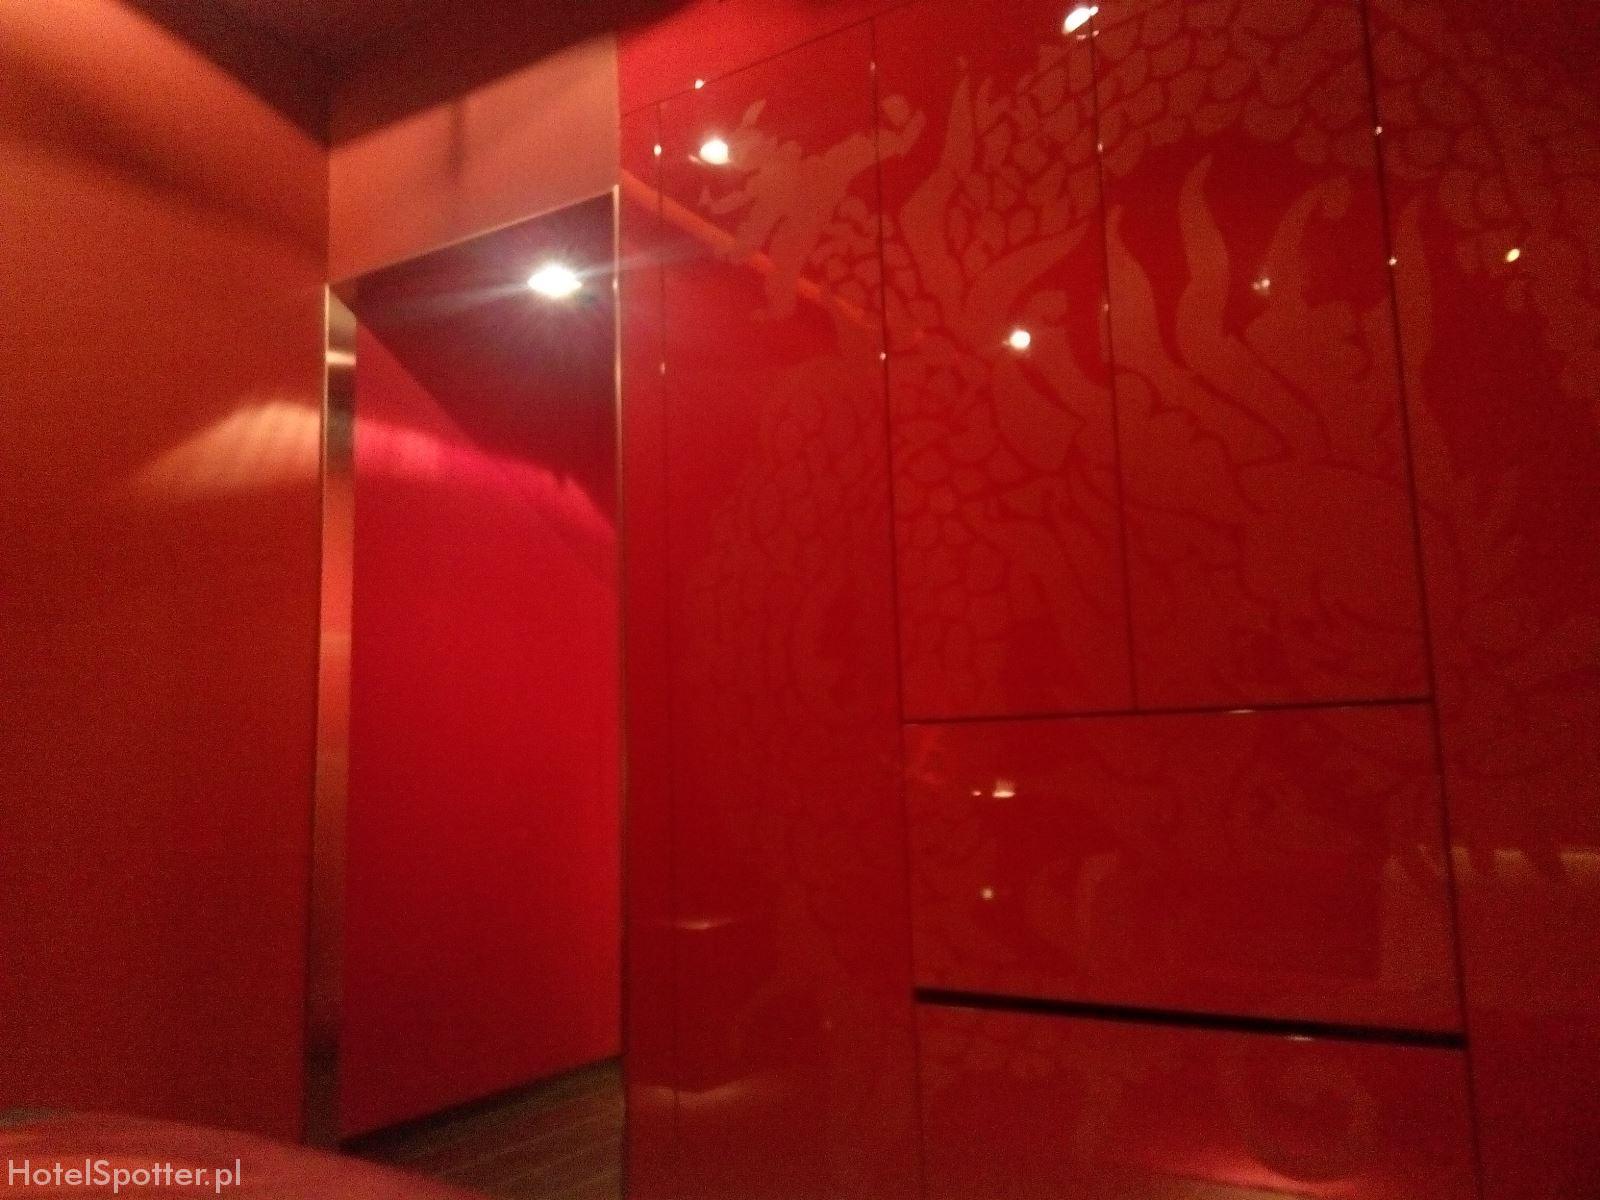 Buddha-Bar Hotel Budapest red walls